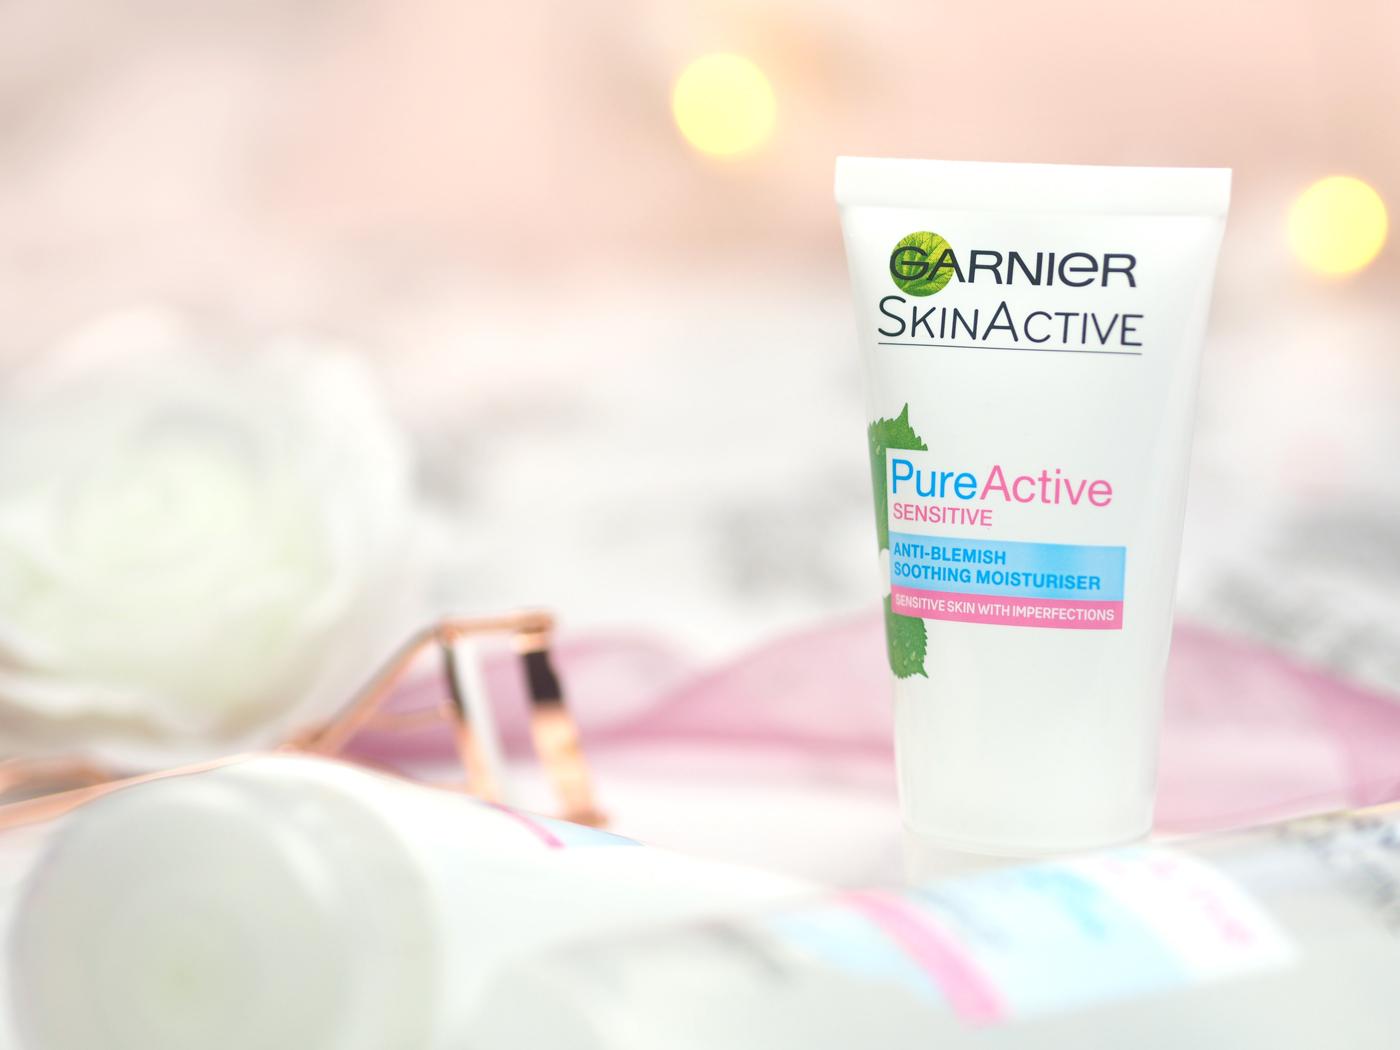 Garnier PureActive Sensitive Soothing Moisturiser